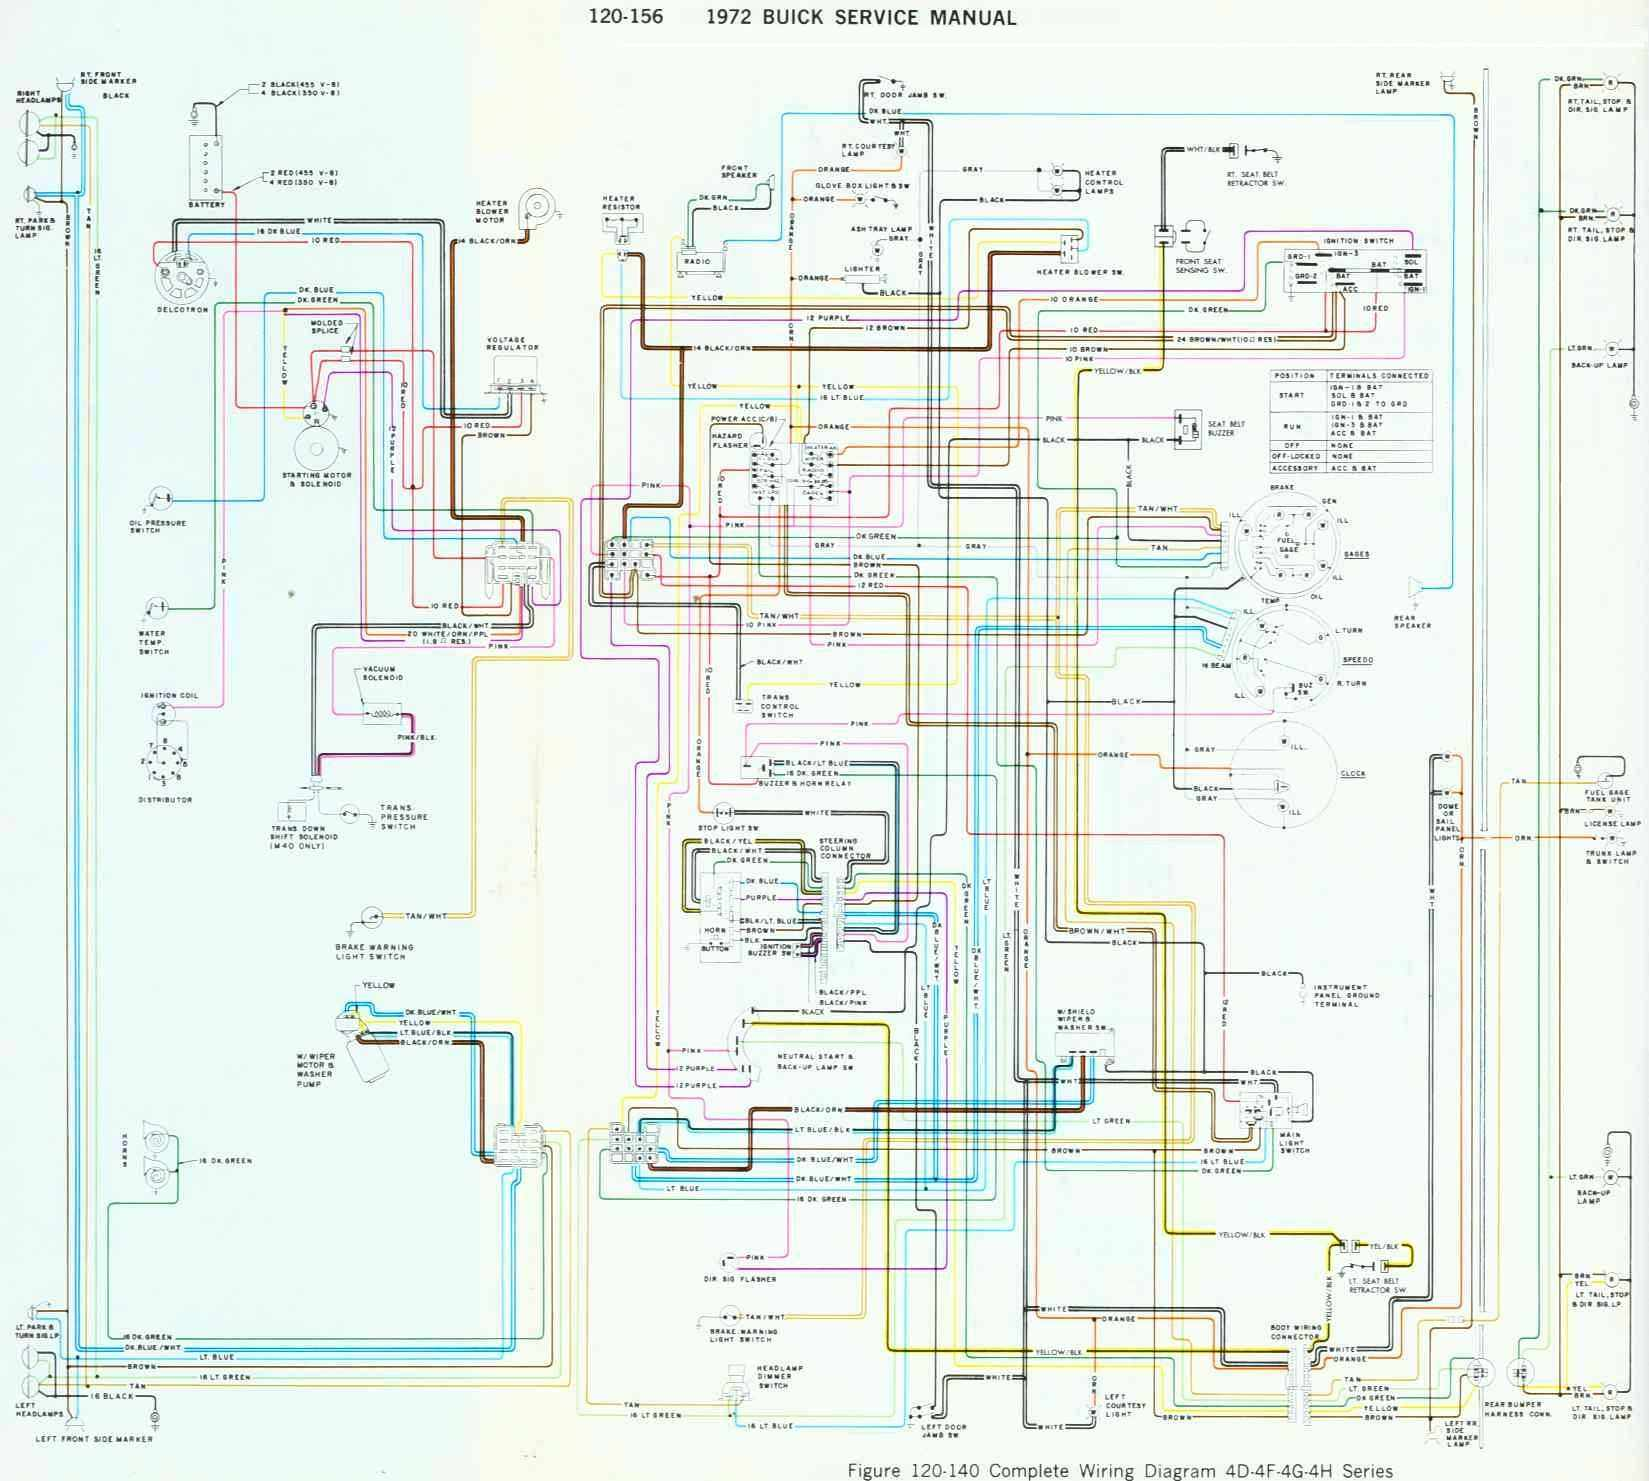 69 Cougar Wiring Diagram Detailed Schematics 1969 Bronco Mercury Auto Electrical